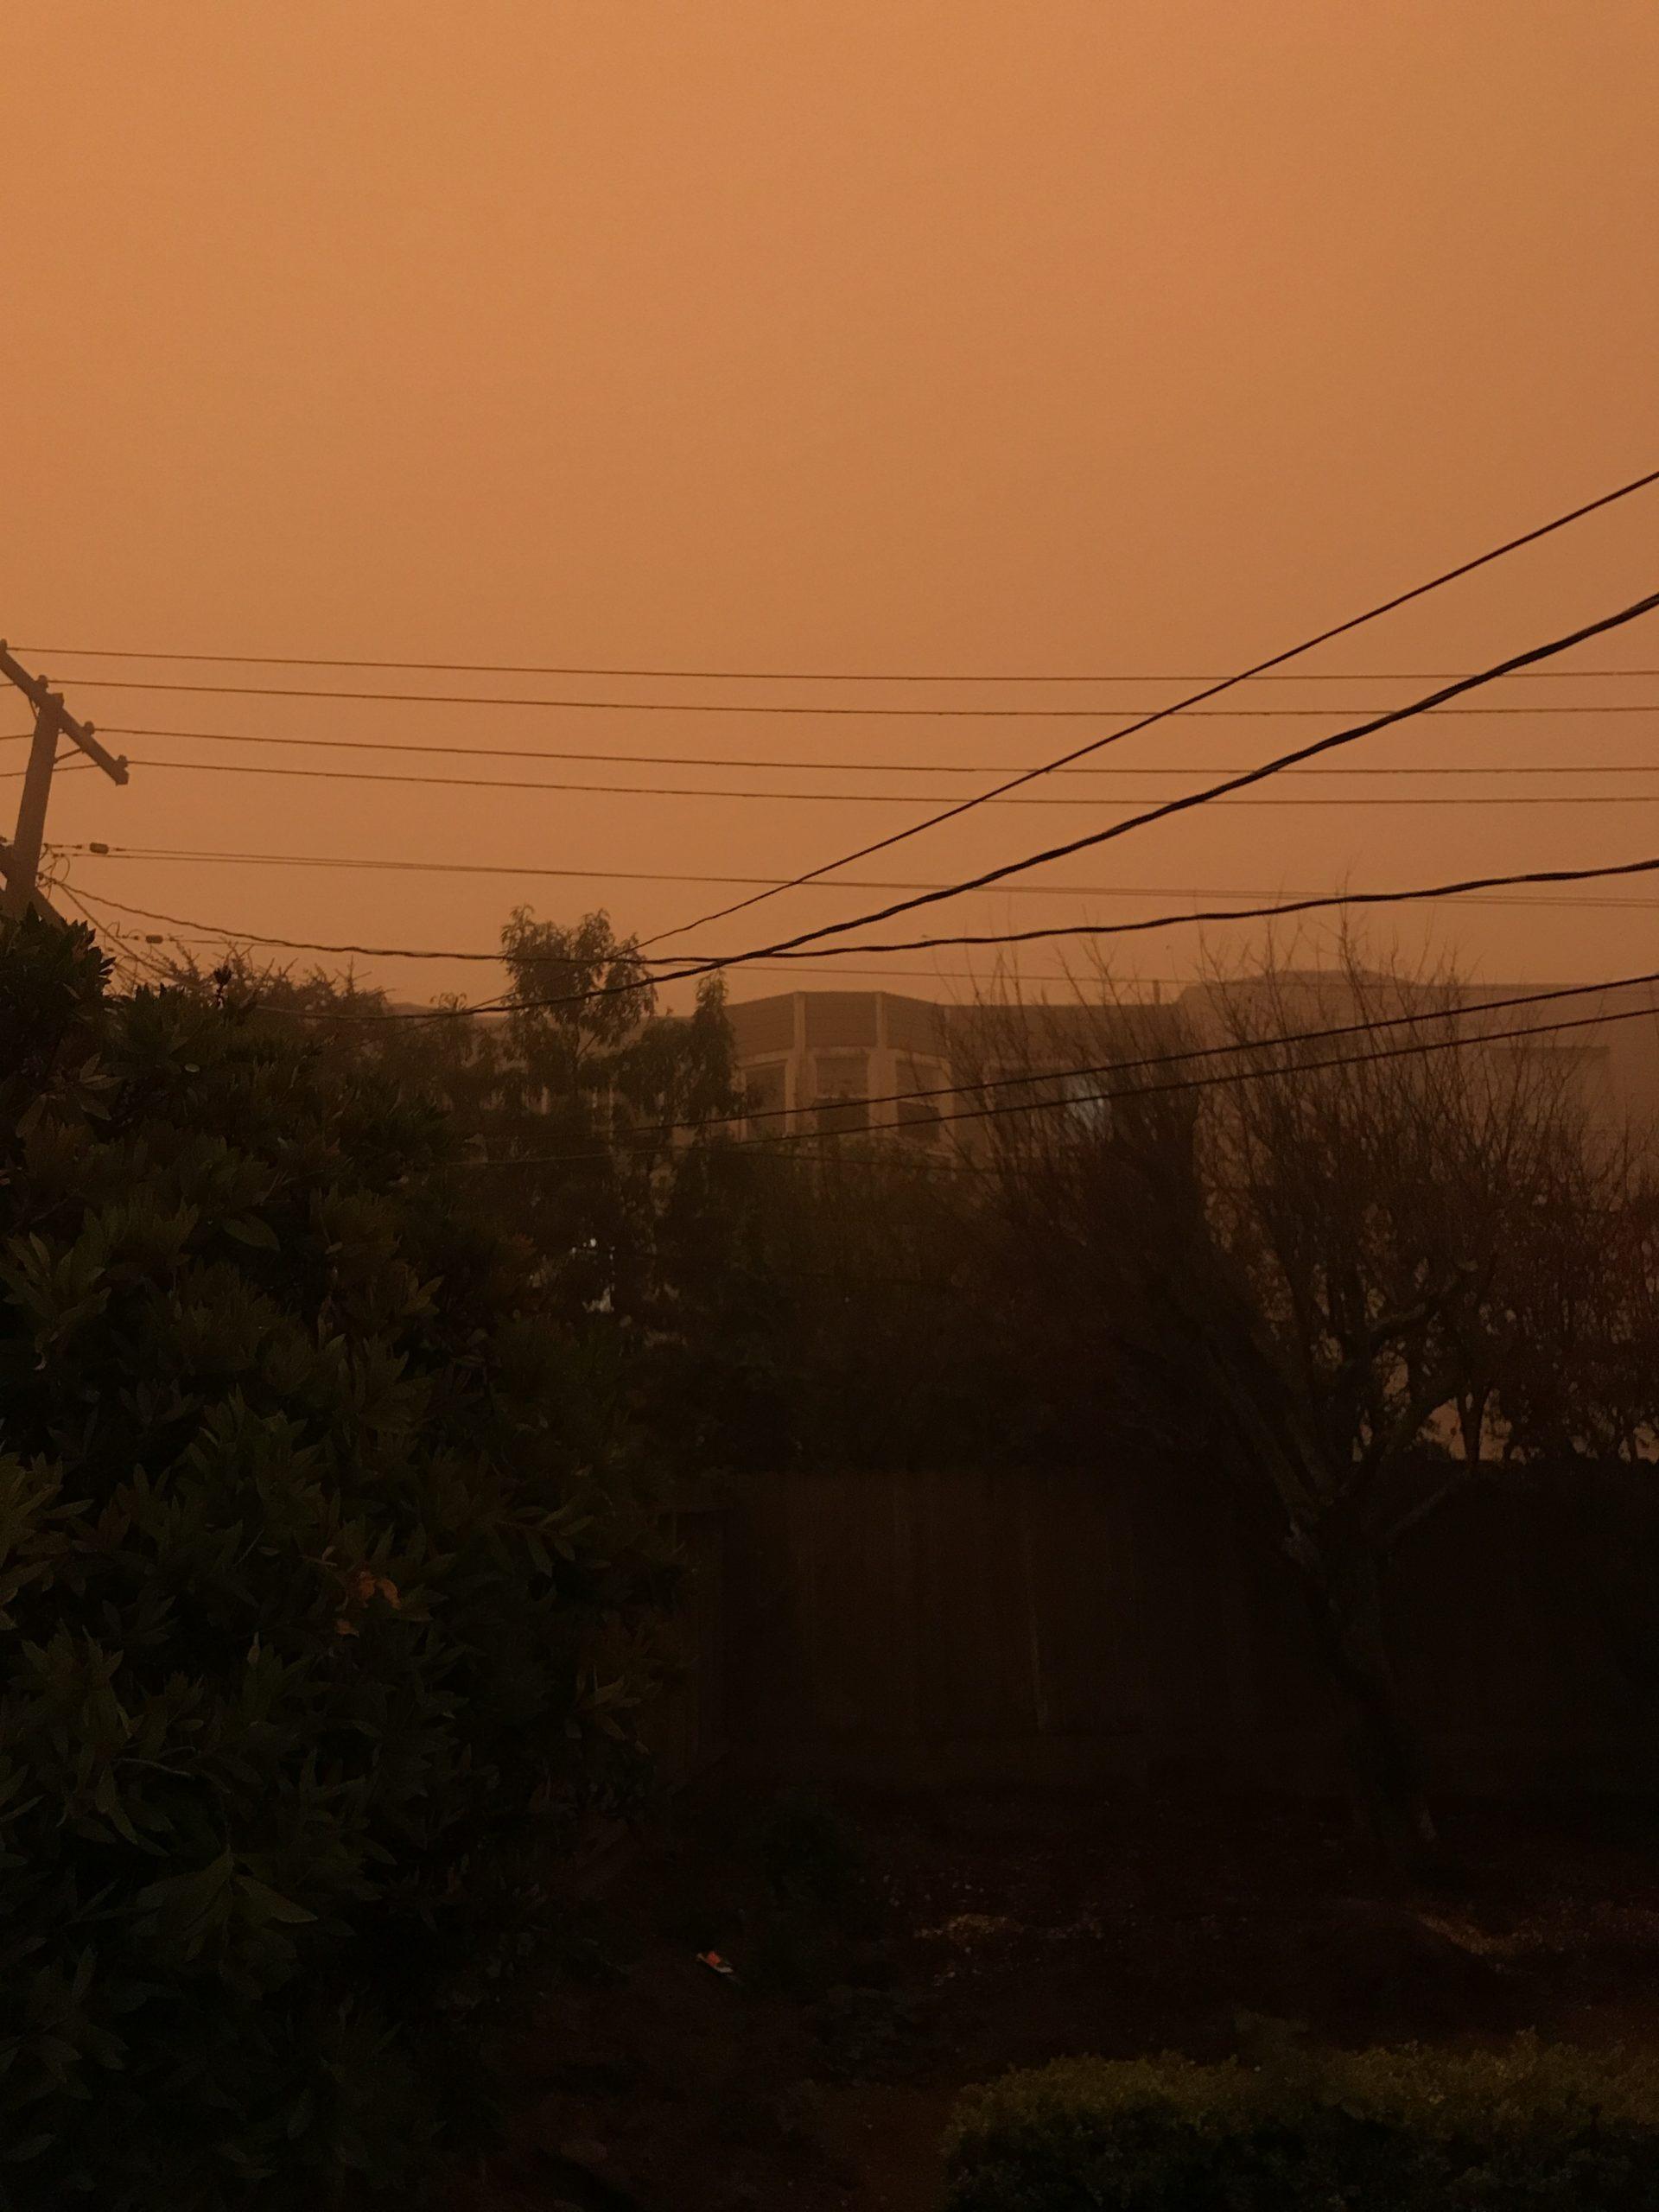 Shaina Lopes picture of orange sky